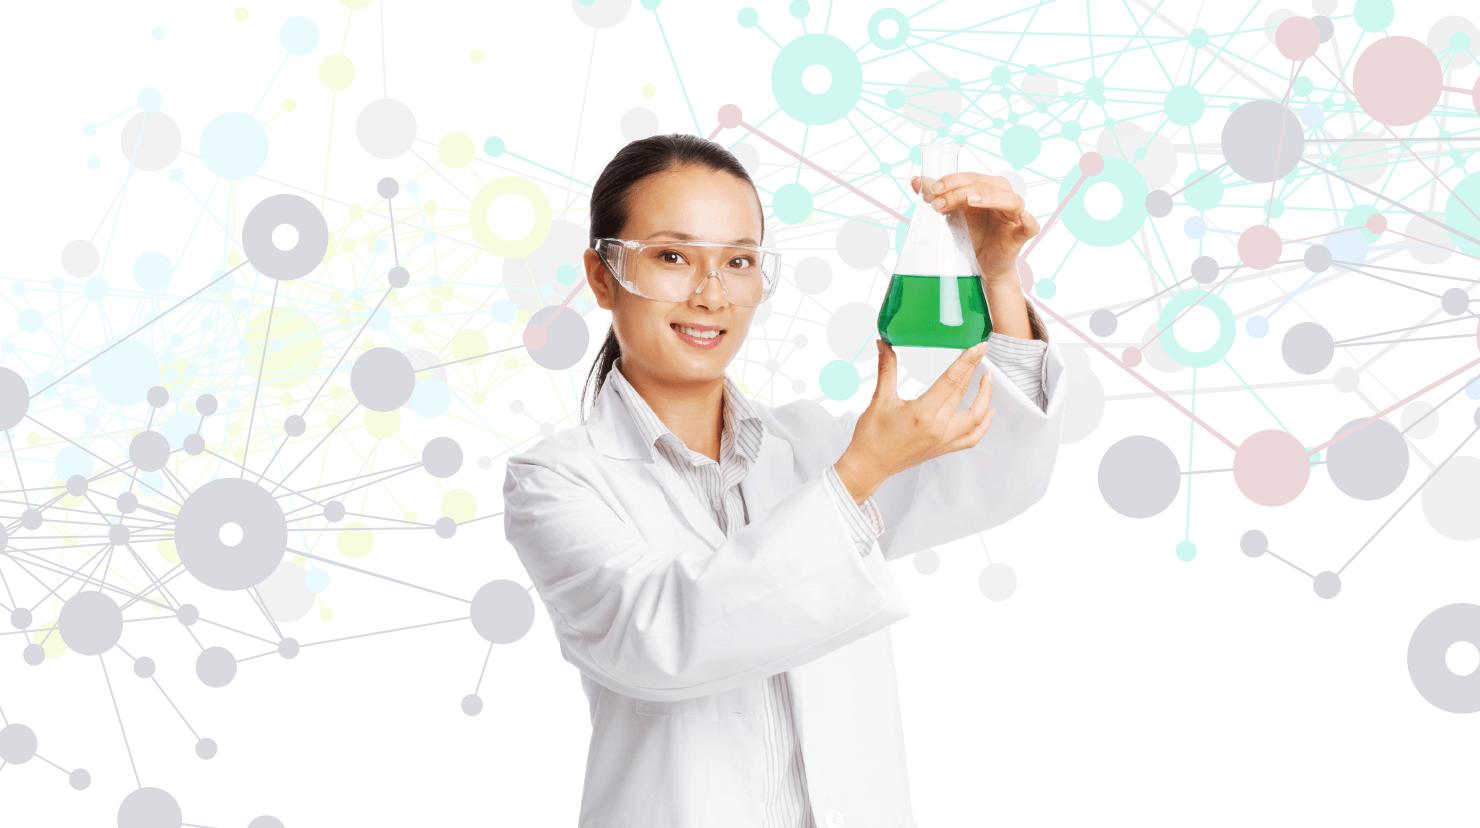 Woman in white lab coat holding beaker